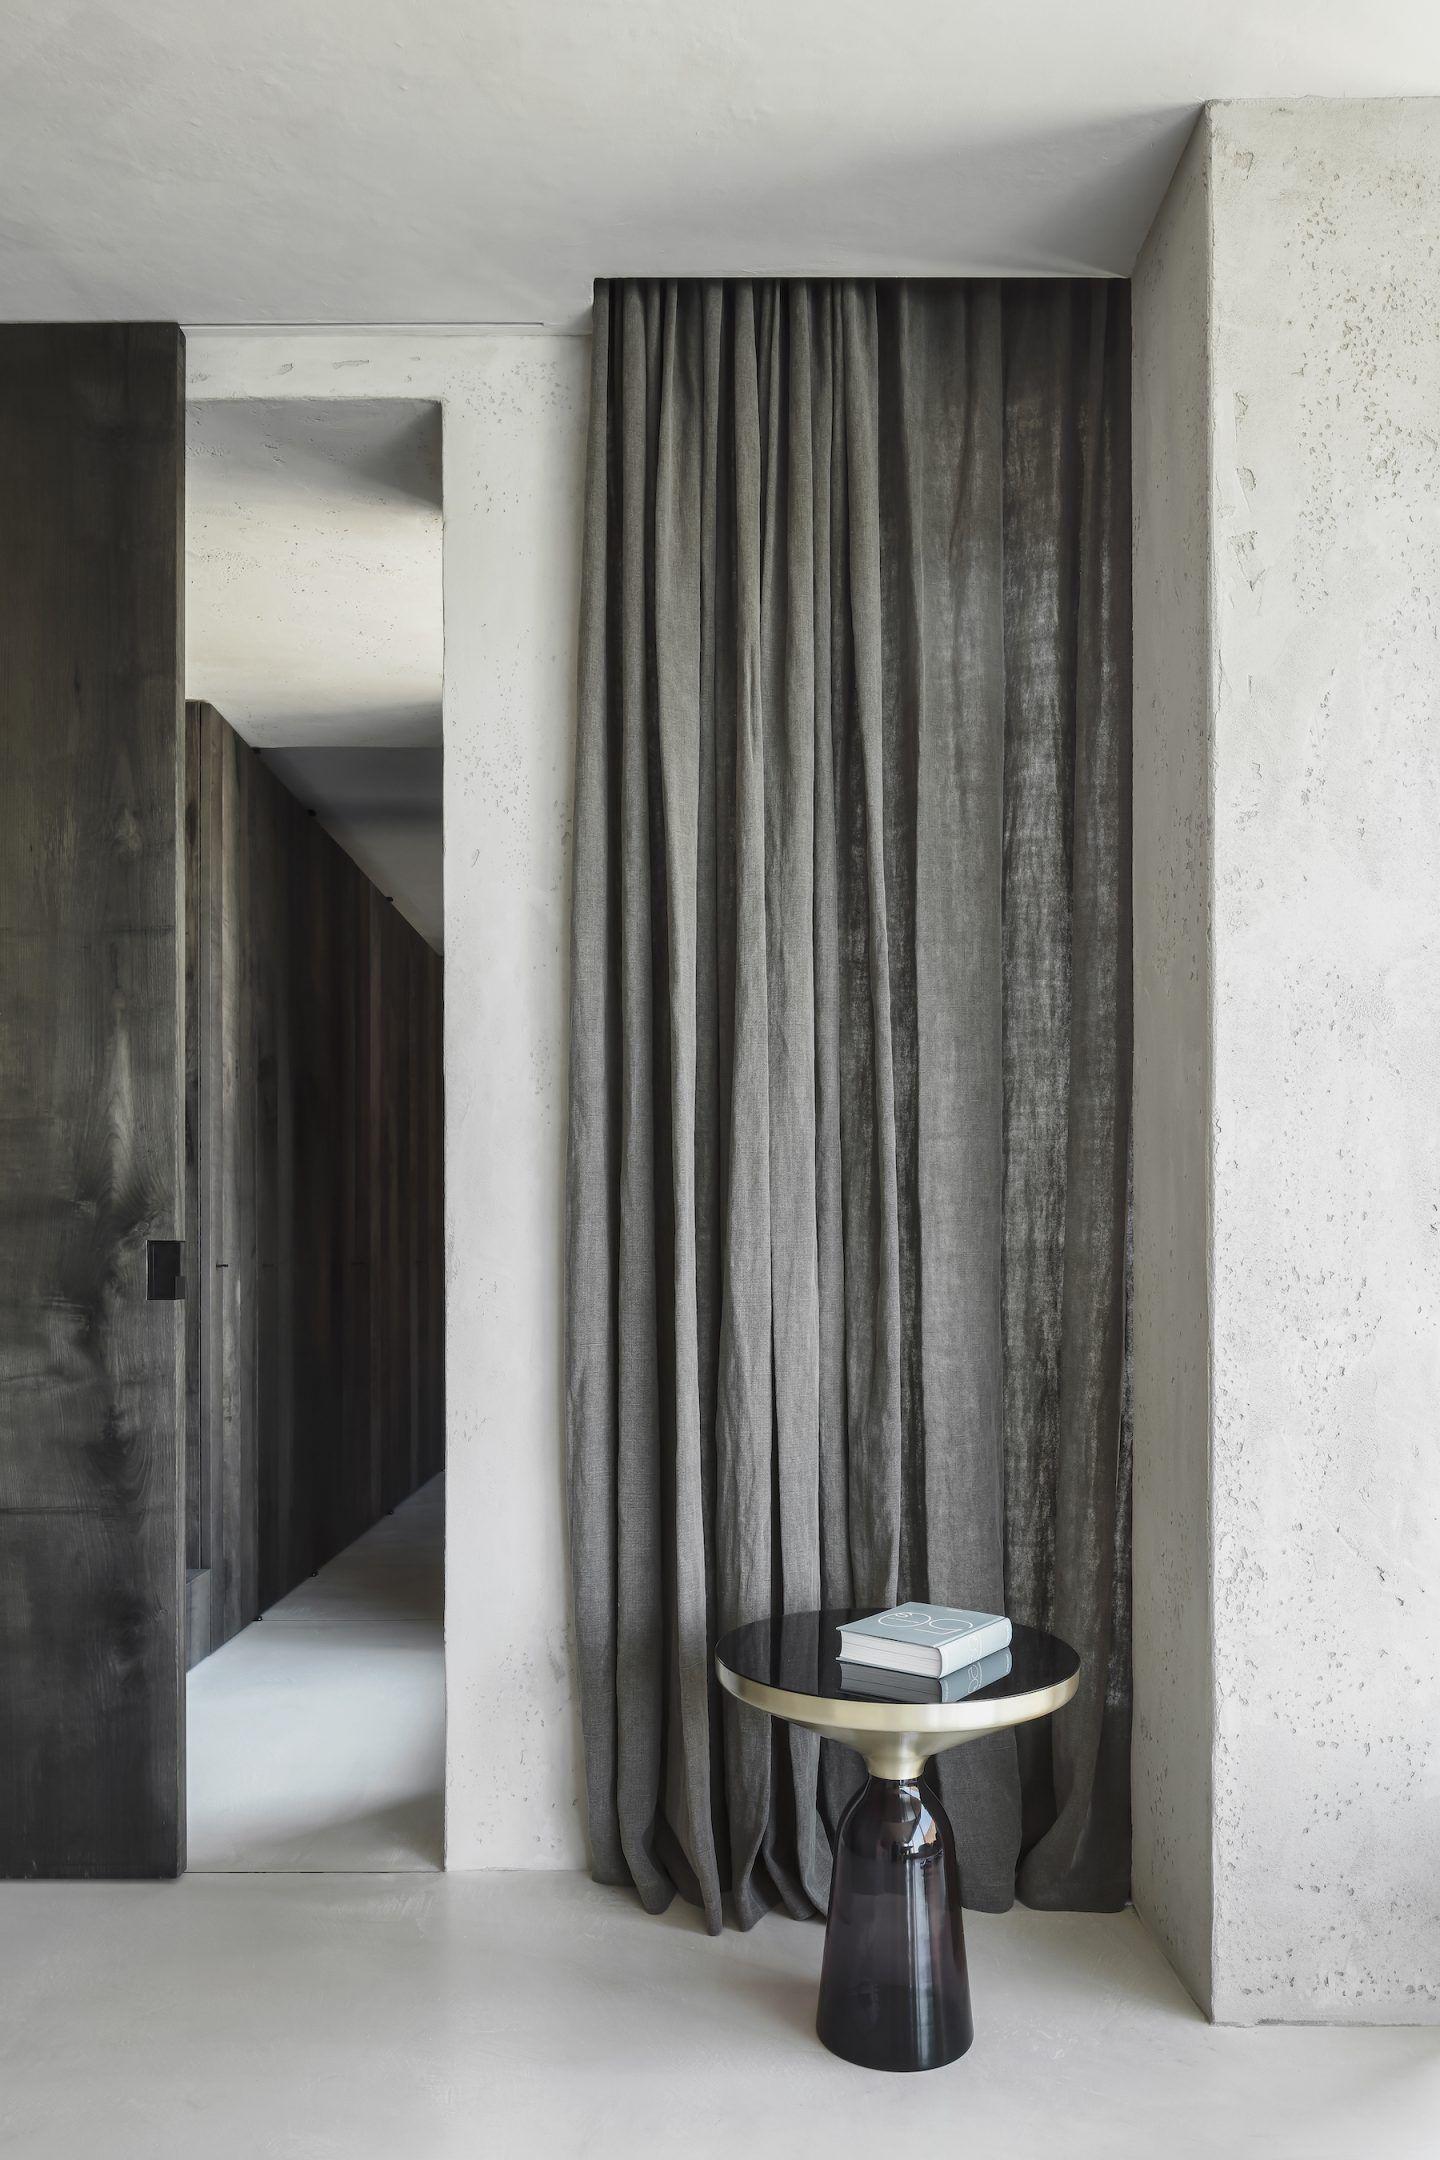 IGNANT-Architecture-Arjaan-De-Feyter-Silo-Apartment-03